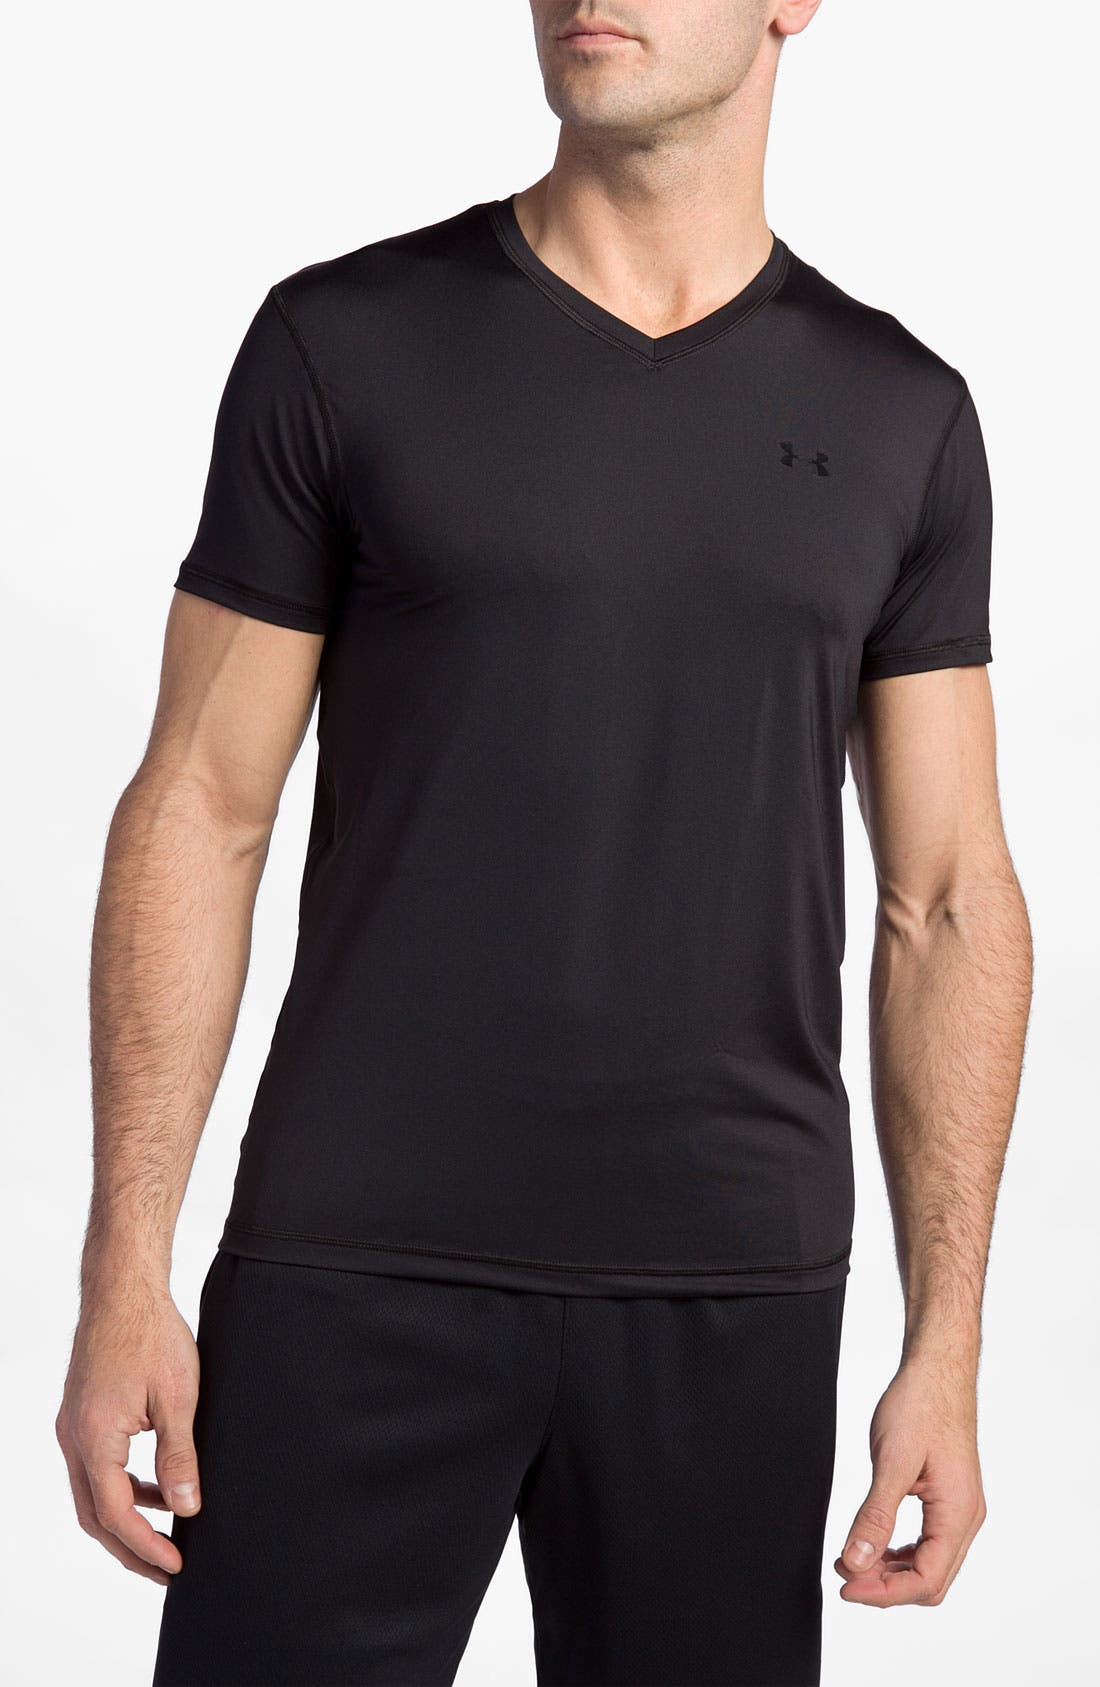 Main Image - Under Armour 'O Series' HeatGear® V-Neck T-Shirt